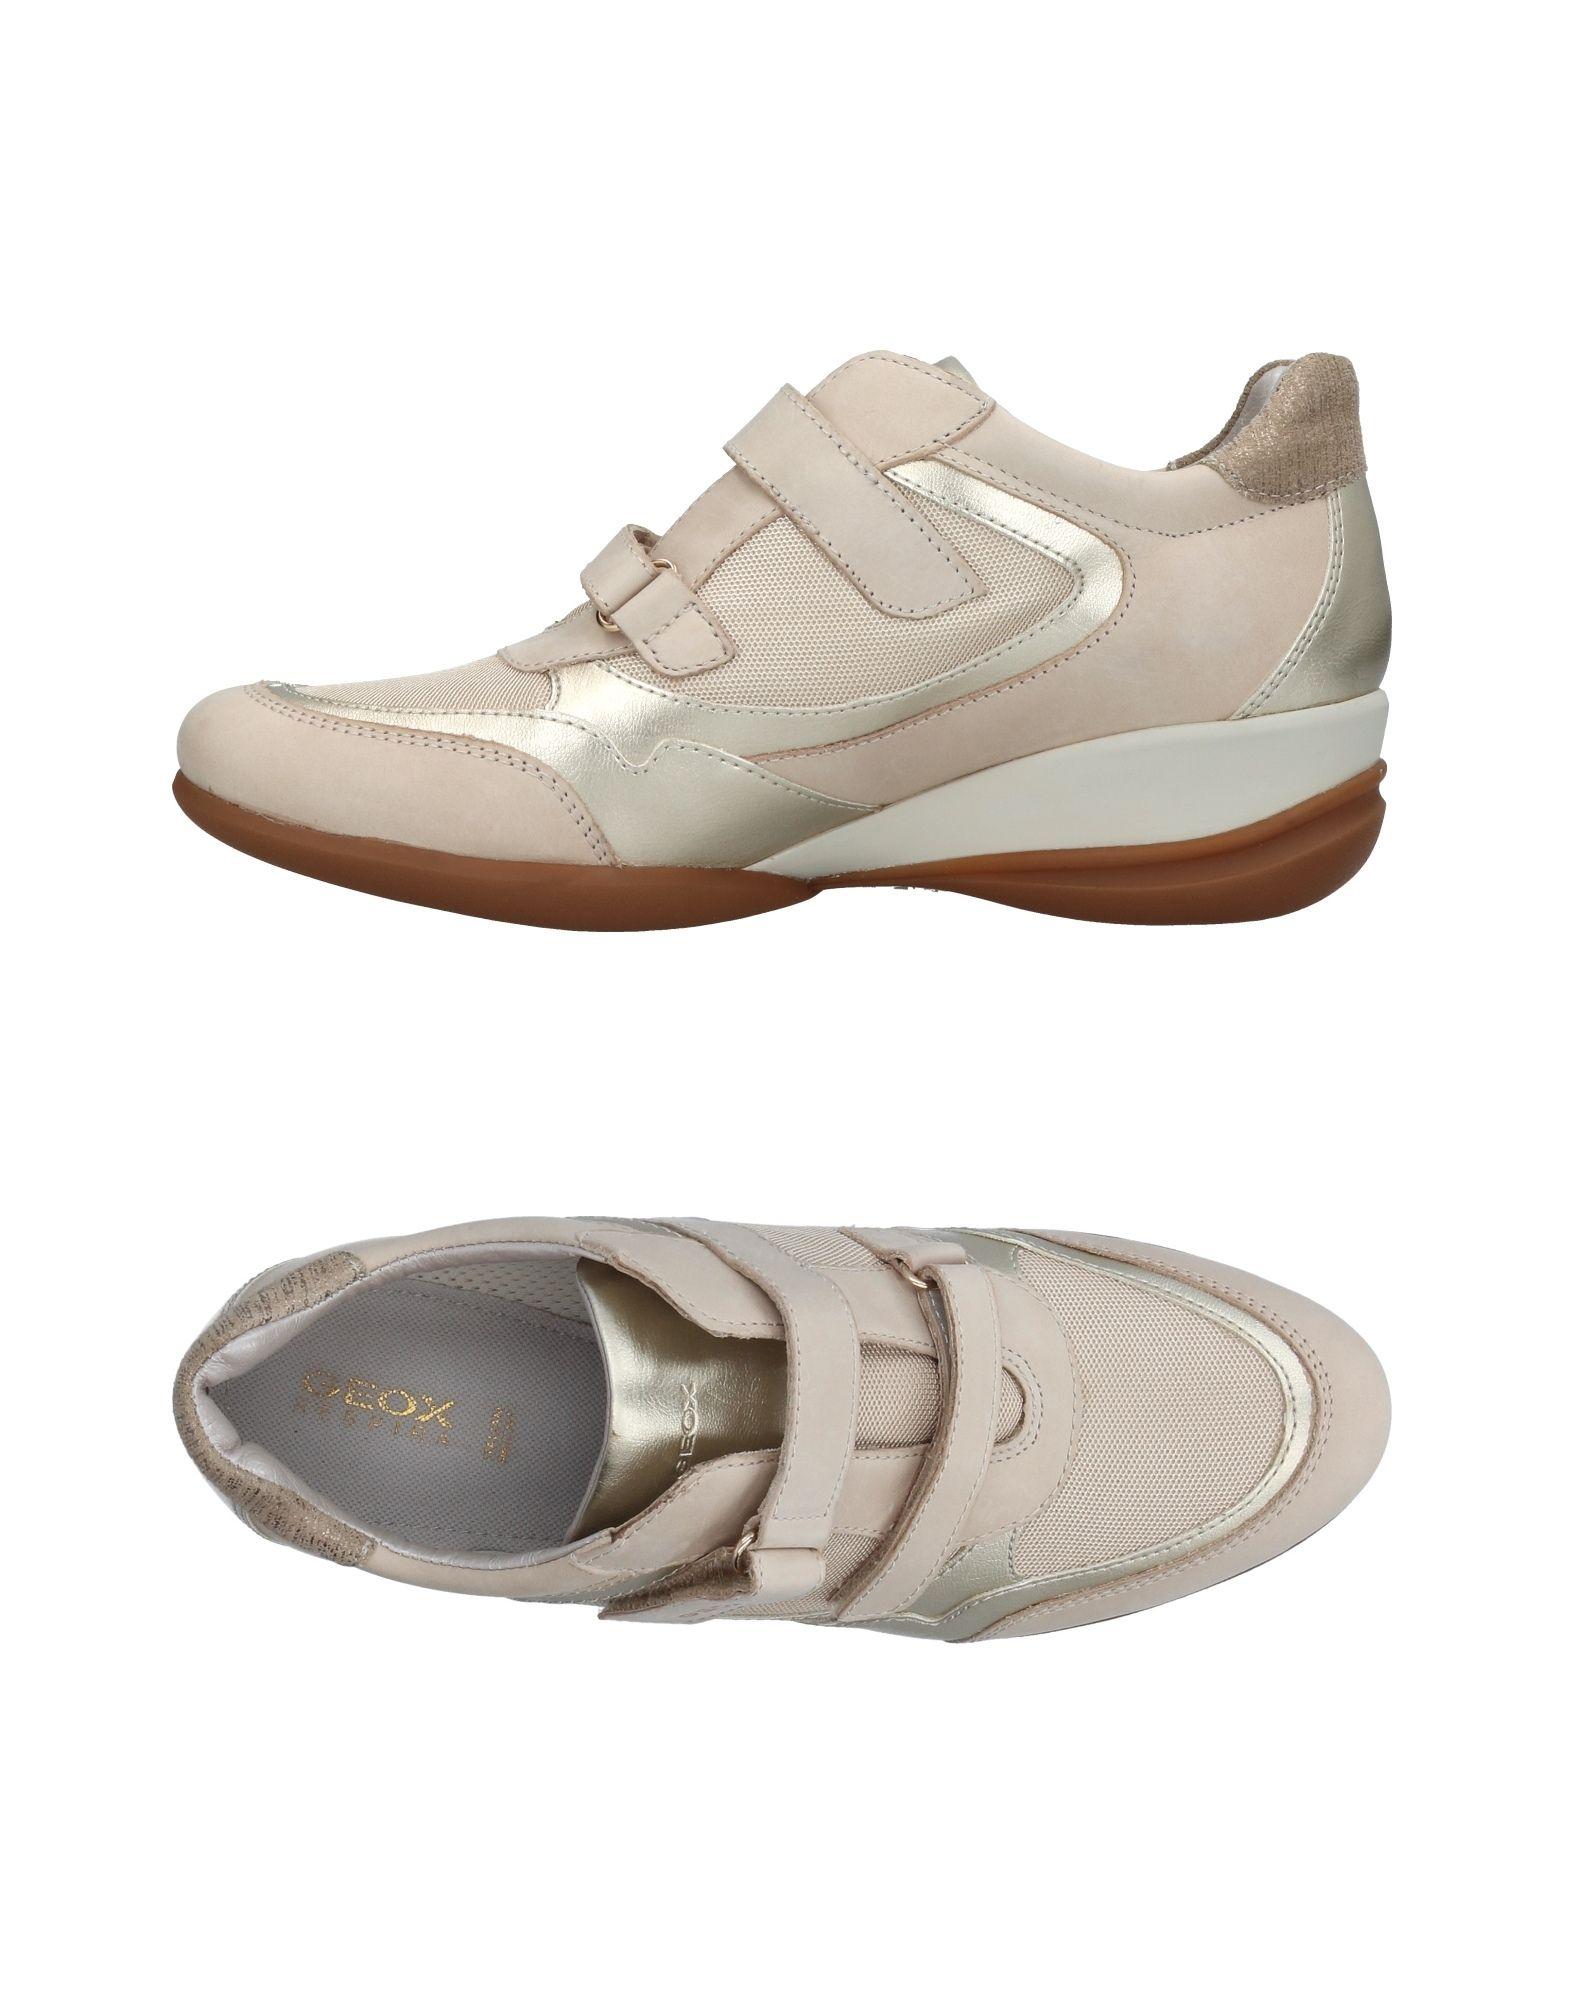 Geox Sneakers Damen  11393159GE Gute Qualität beliebte Schuhe